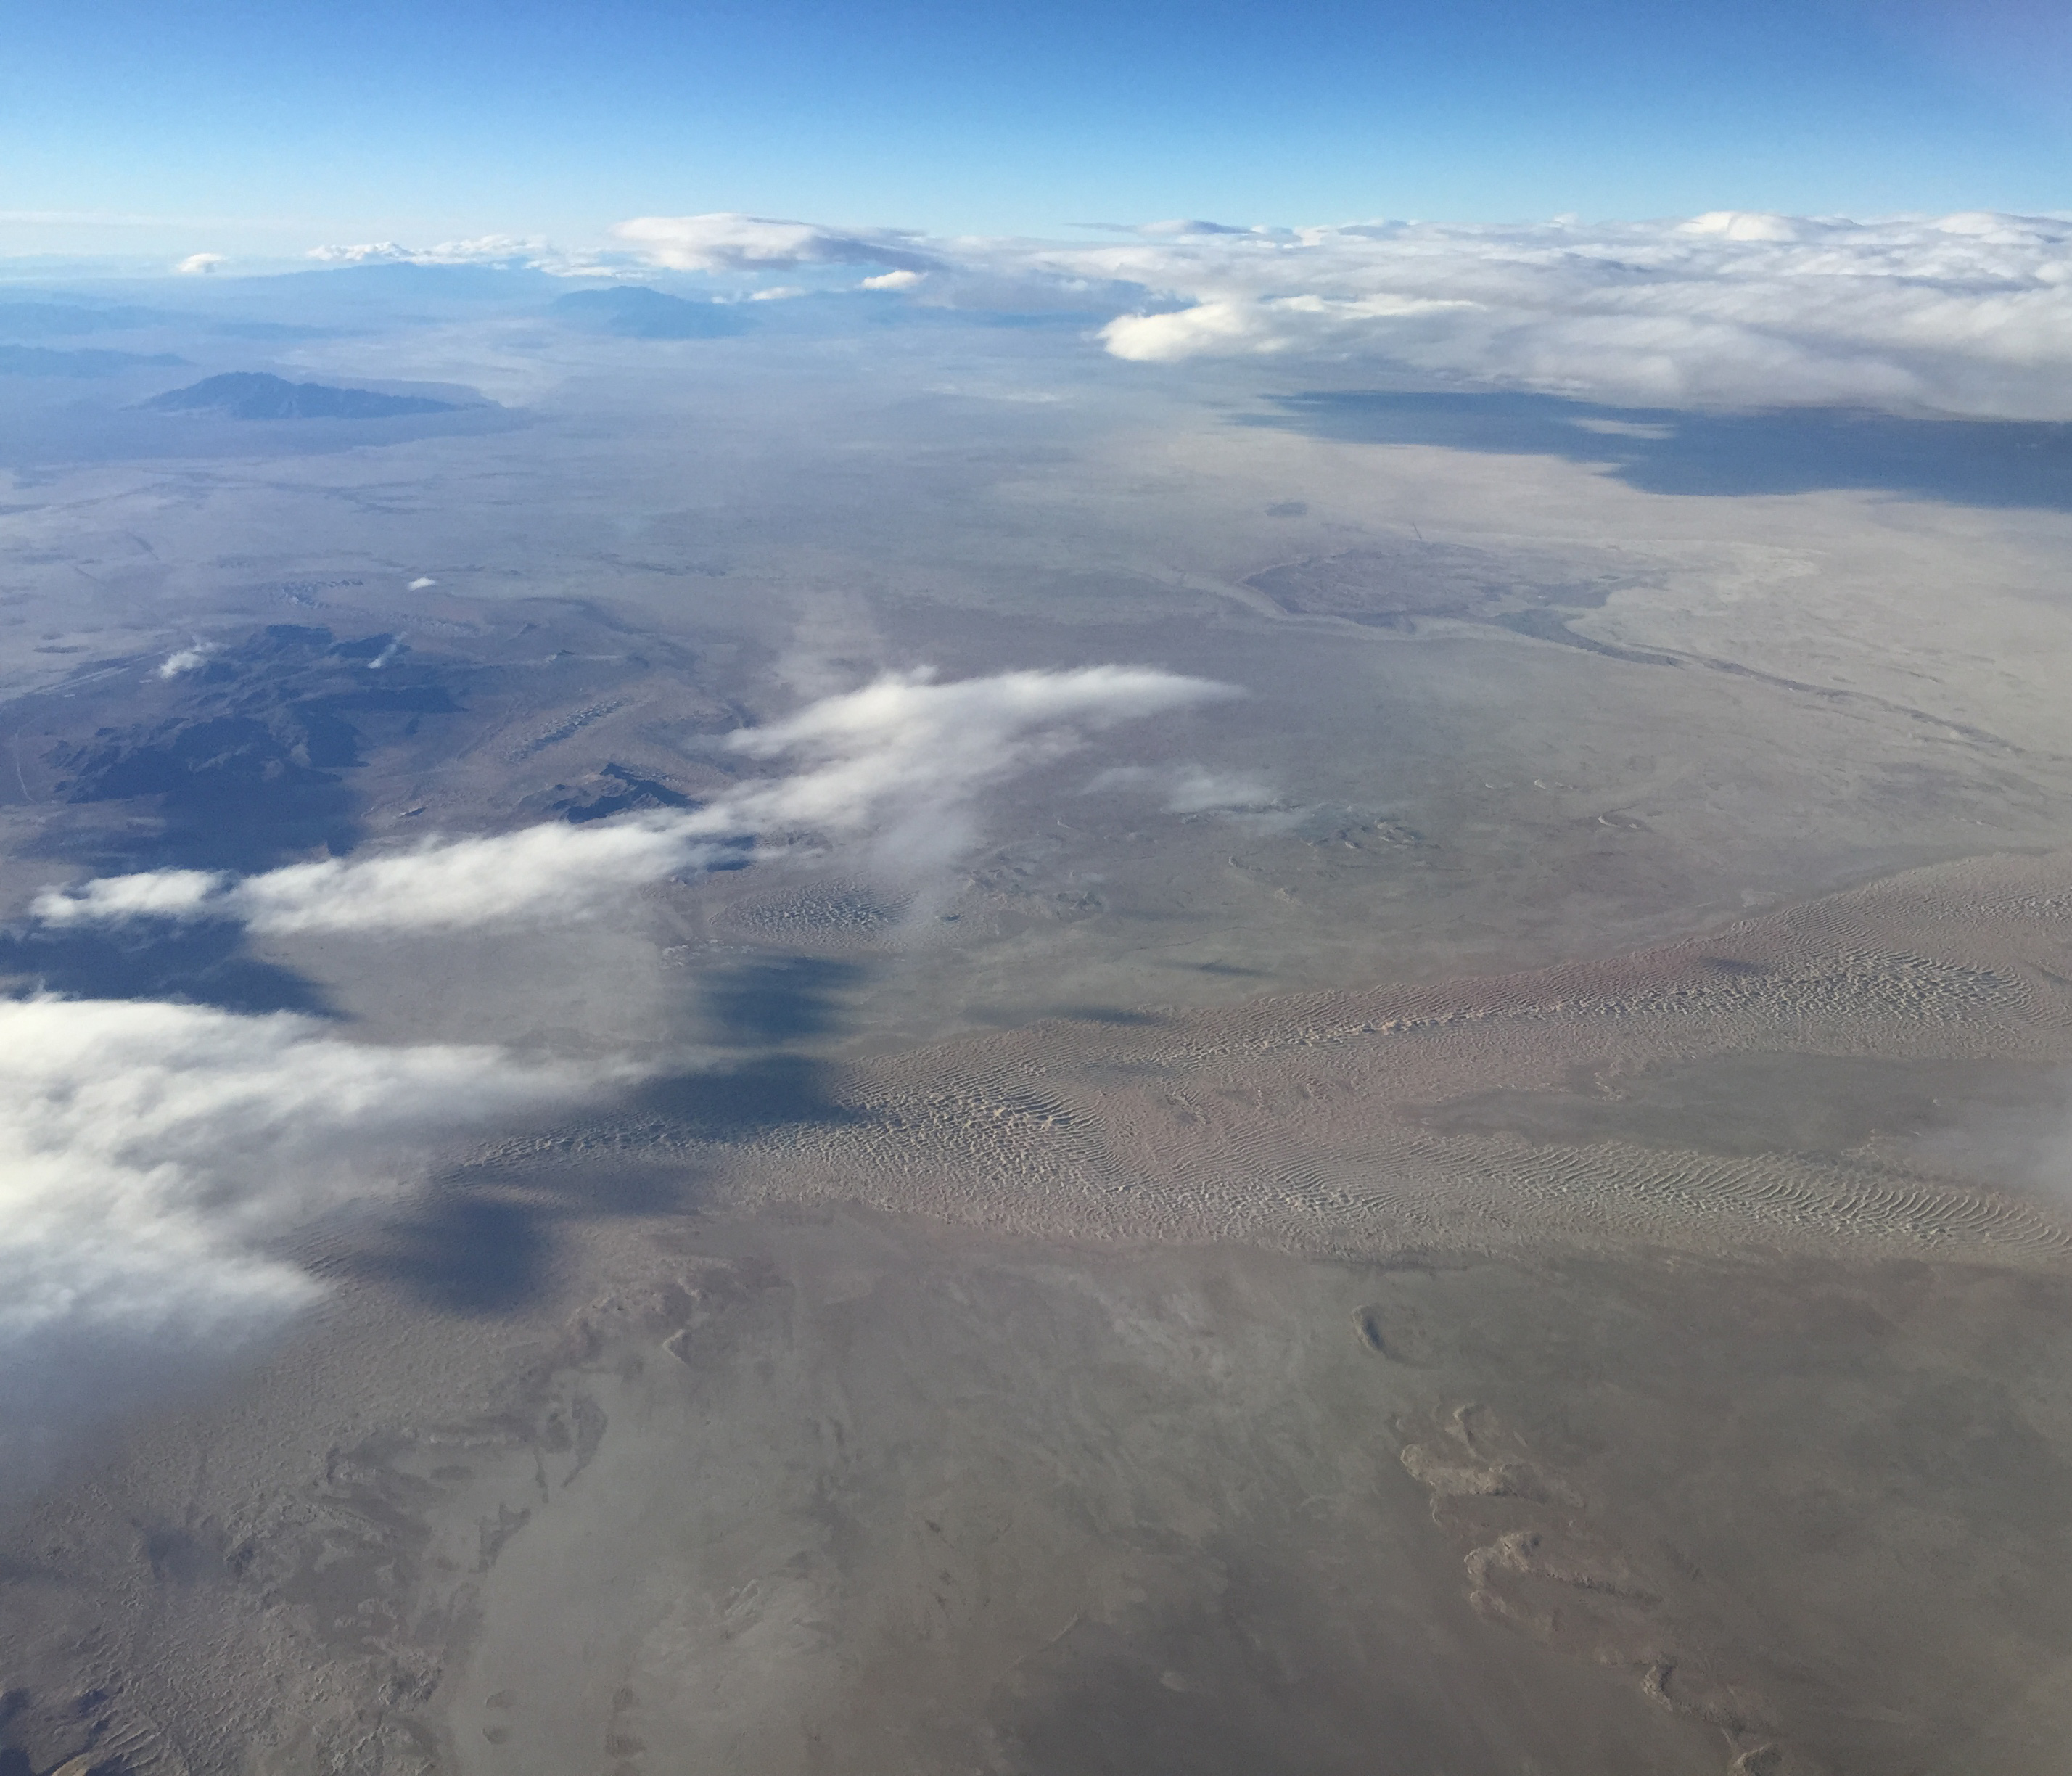 File 2015 11 03 08 22 42 View South Across The Utah Test Range In